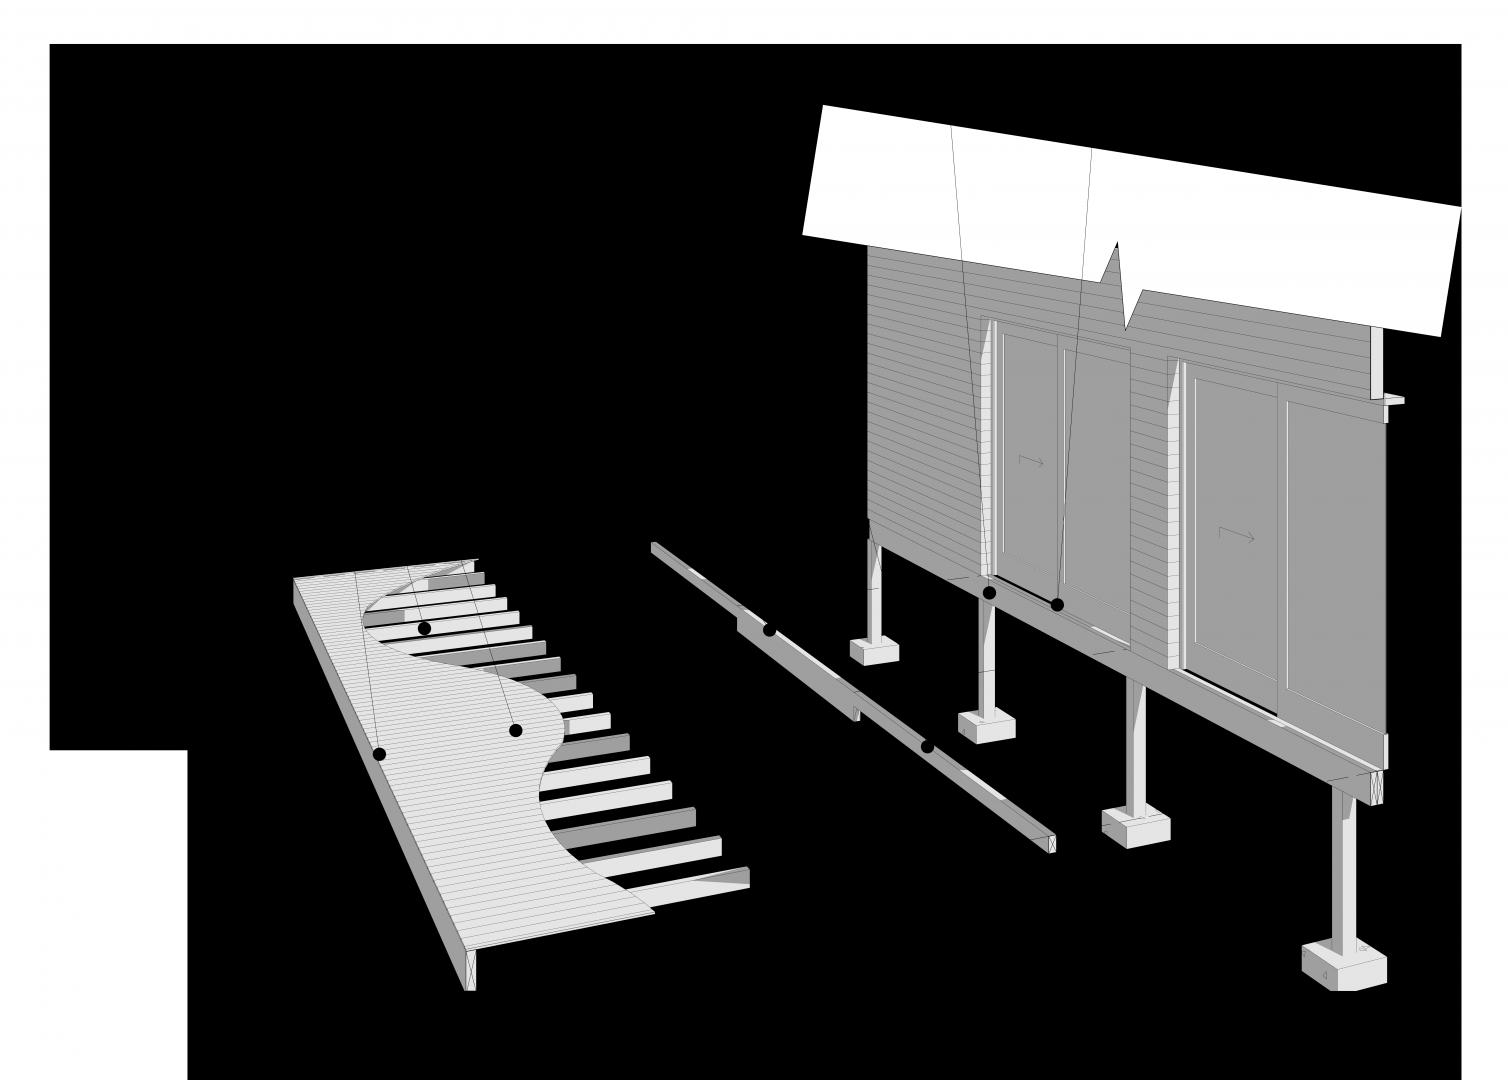 Whalar Diagram